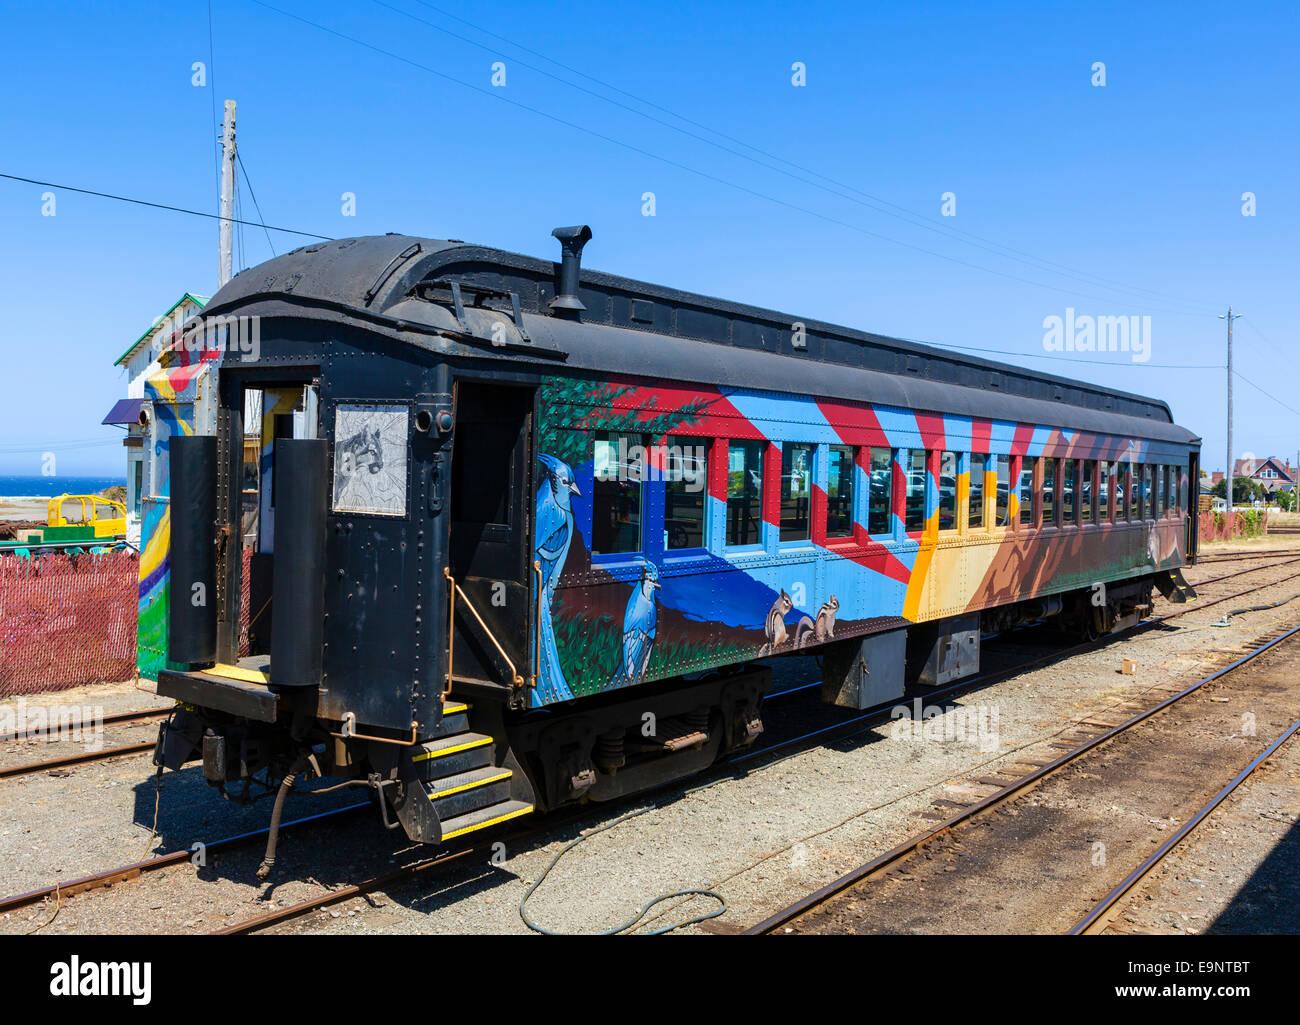 Skunk Train carriage at the terminus in Fort Bragg, Mendocino, California, USA - Stock Image